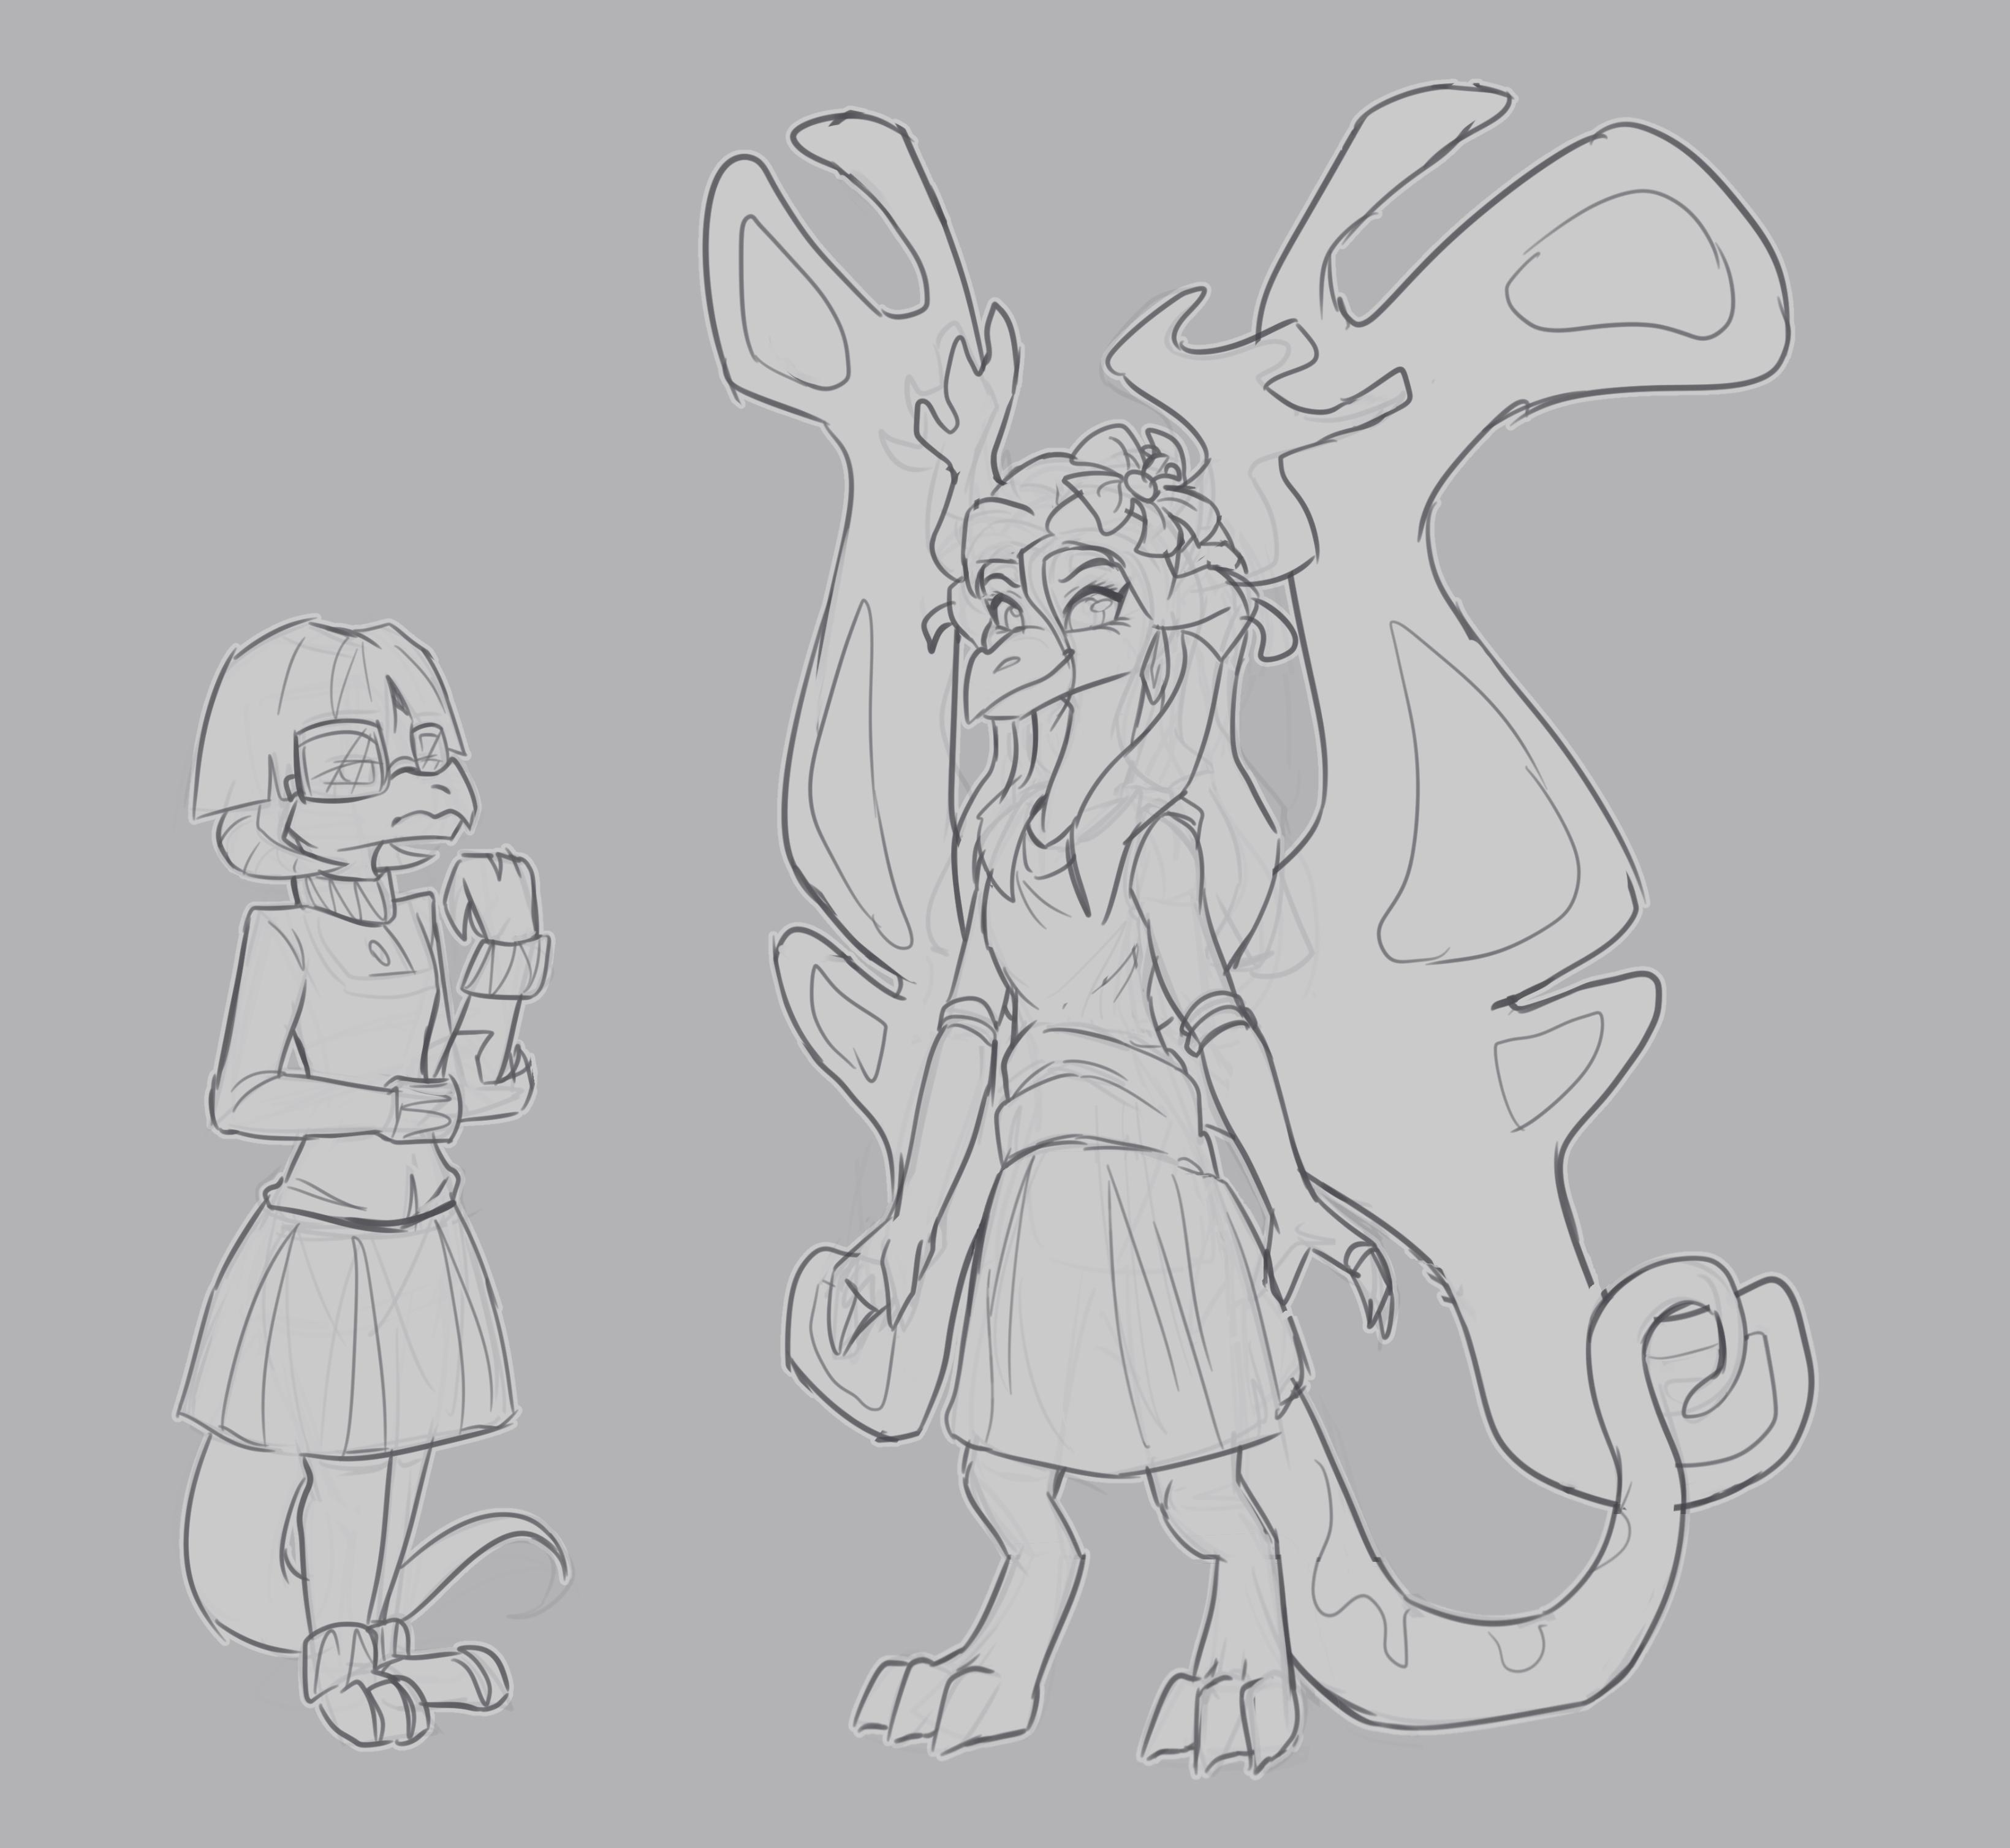 Dragon character sketches